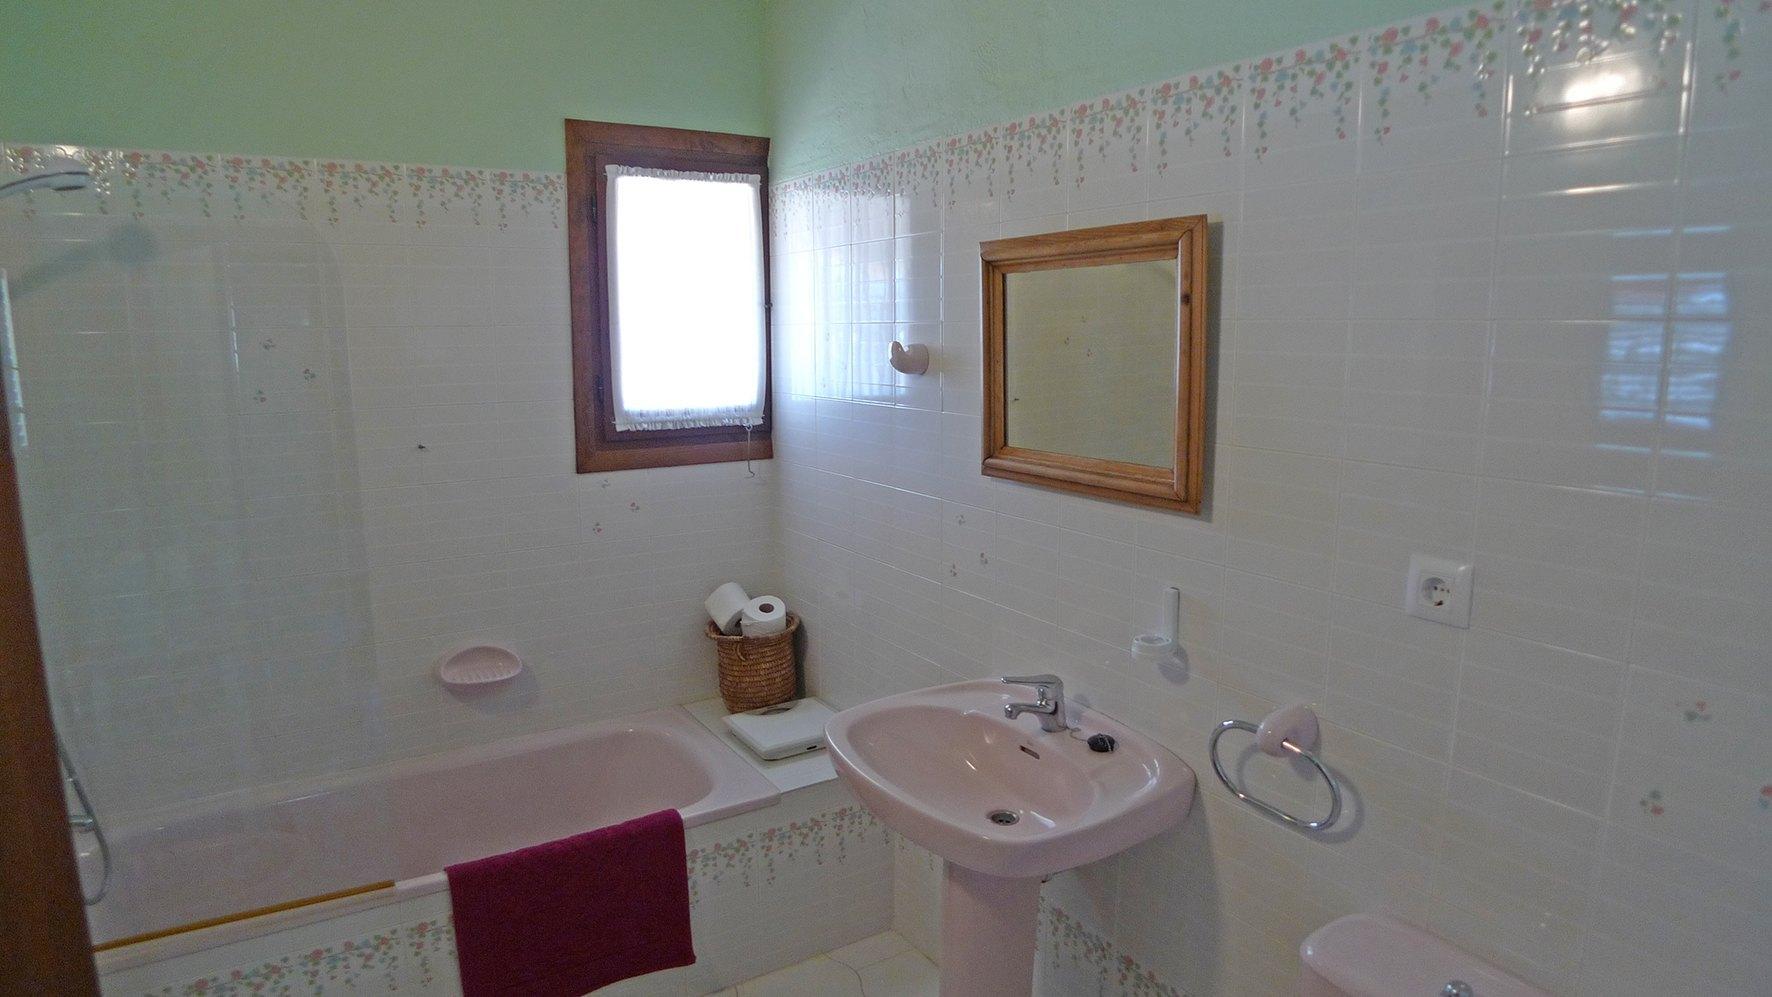 apartamentosdenialowcost-propiedades_5b76a4c92579f-source.jpg